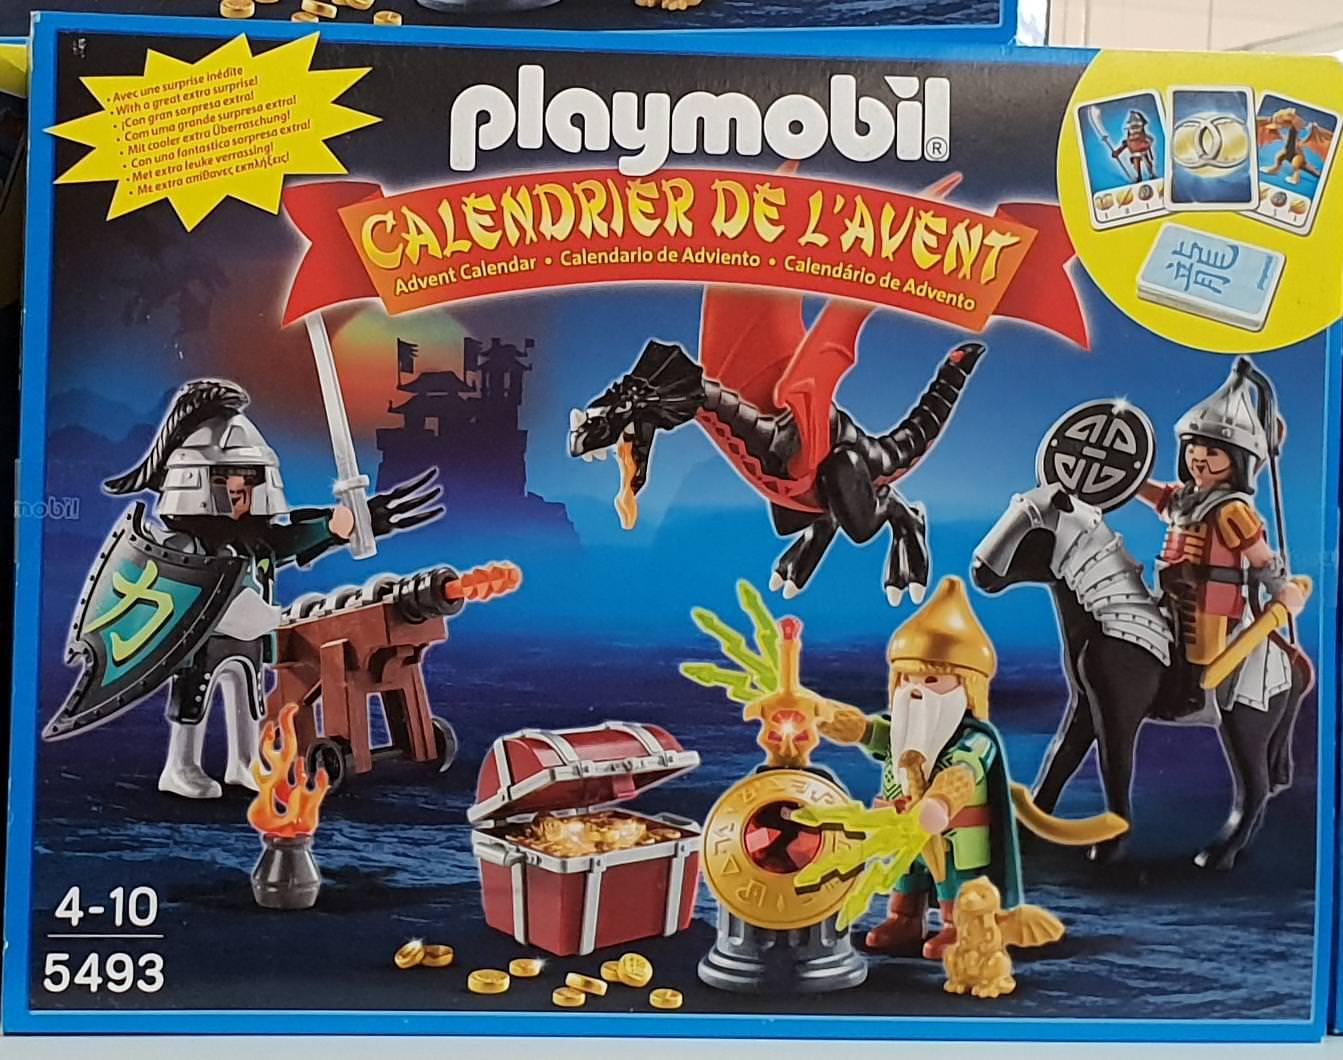 Playmobil Adventskalender Kampf um den Drachenschatz (5493) bei Thomas Philipps [Nauheim]